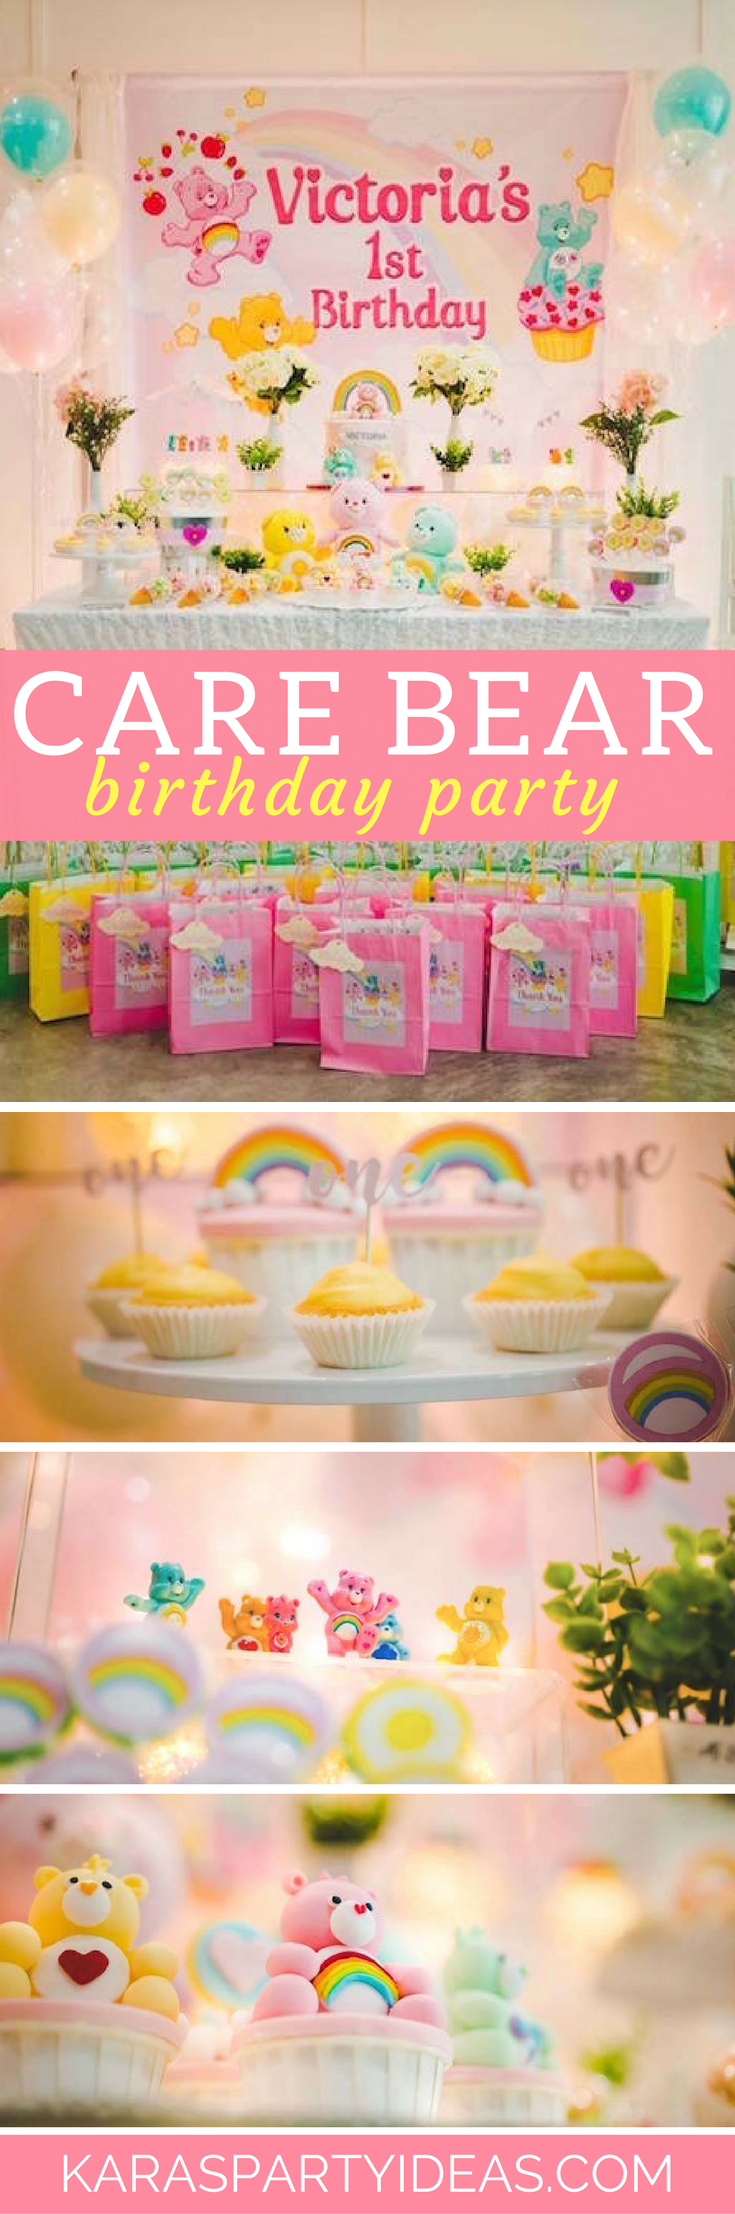 Karas party ideas care bear birthday party karas party ideas care bear birthday party via karas party ideas karaspartyideas monicamarmolfo Choice Image